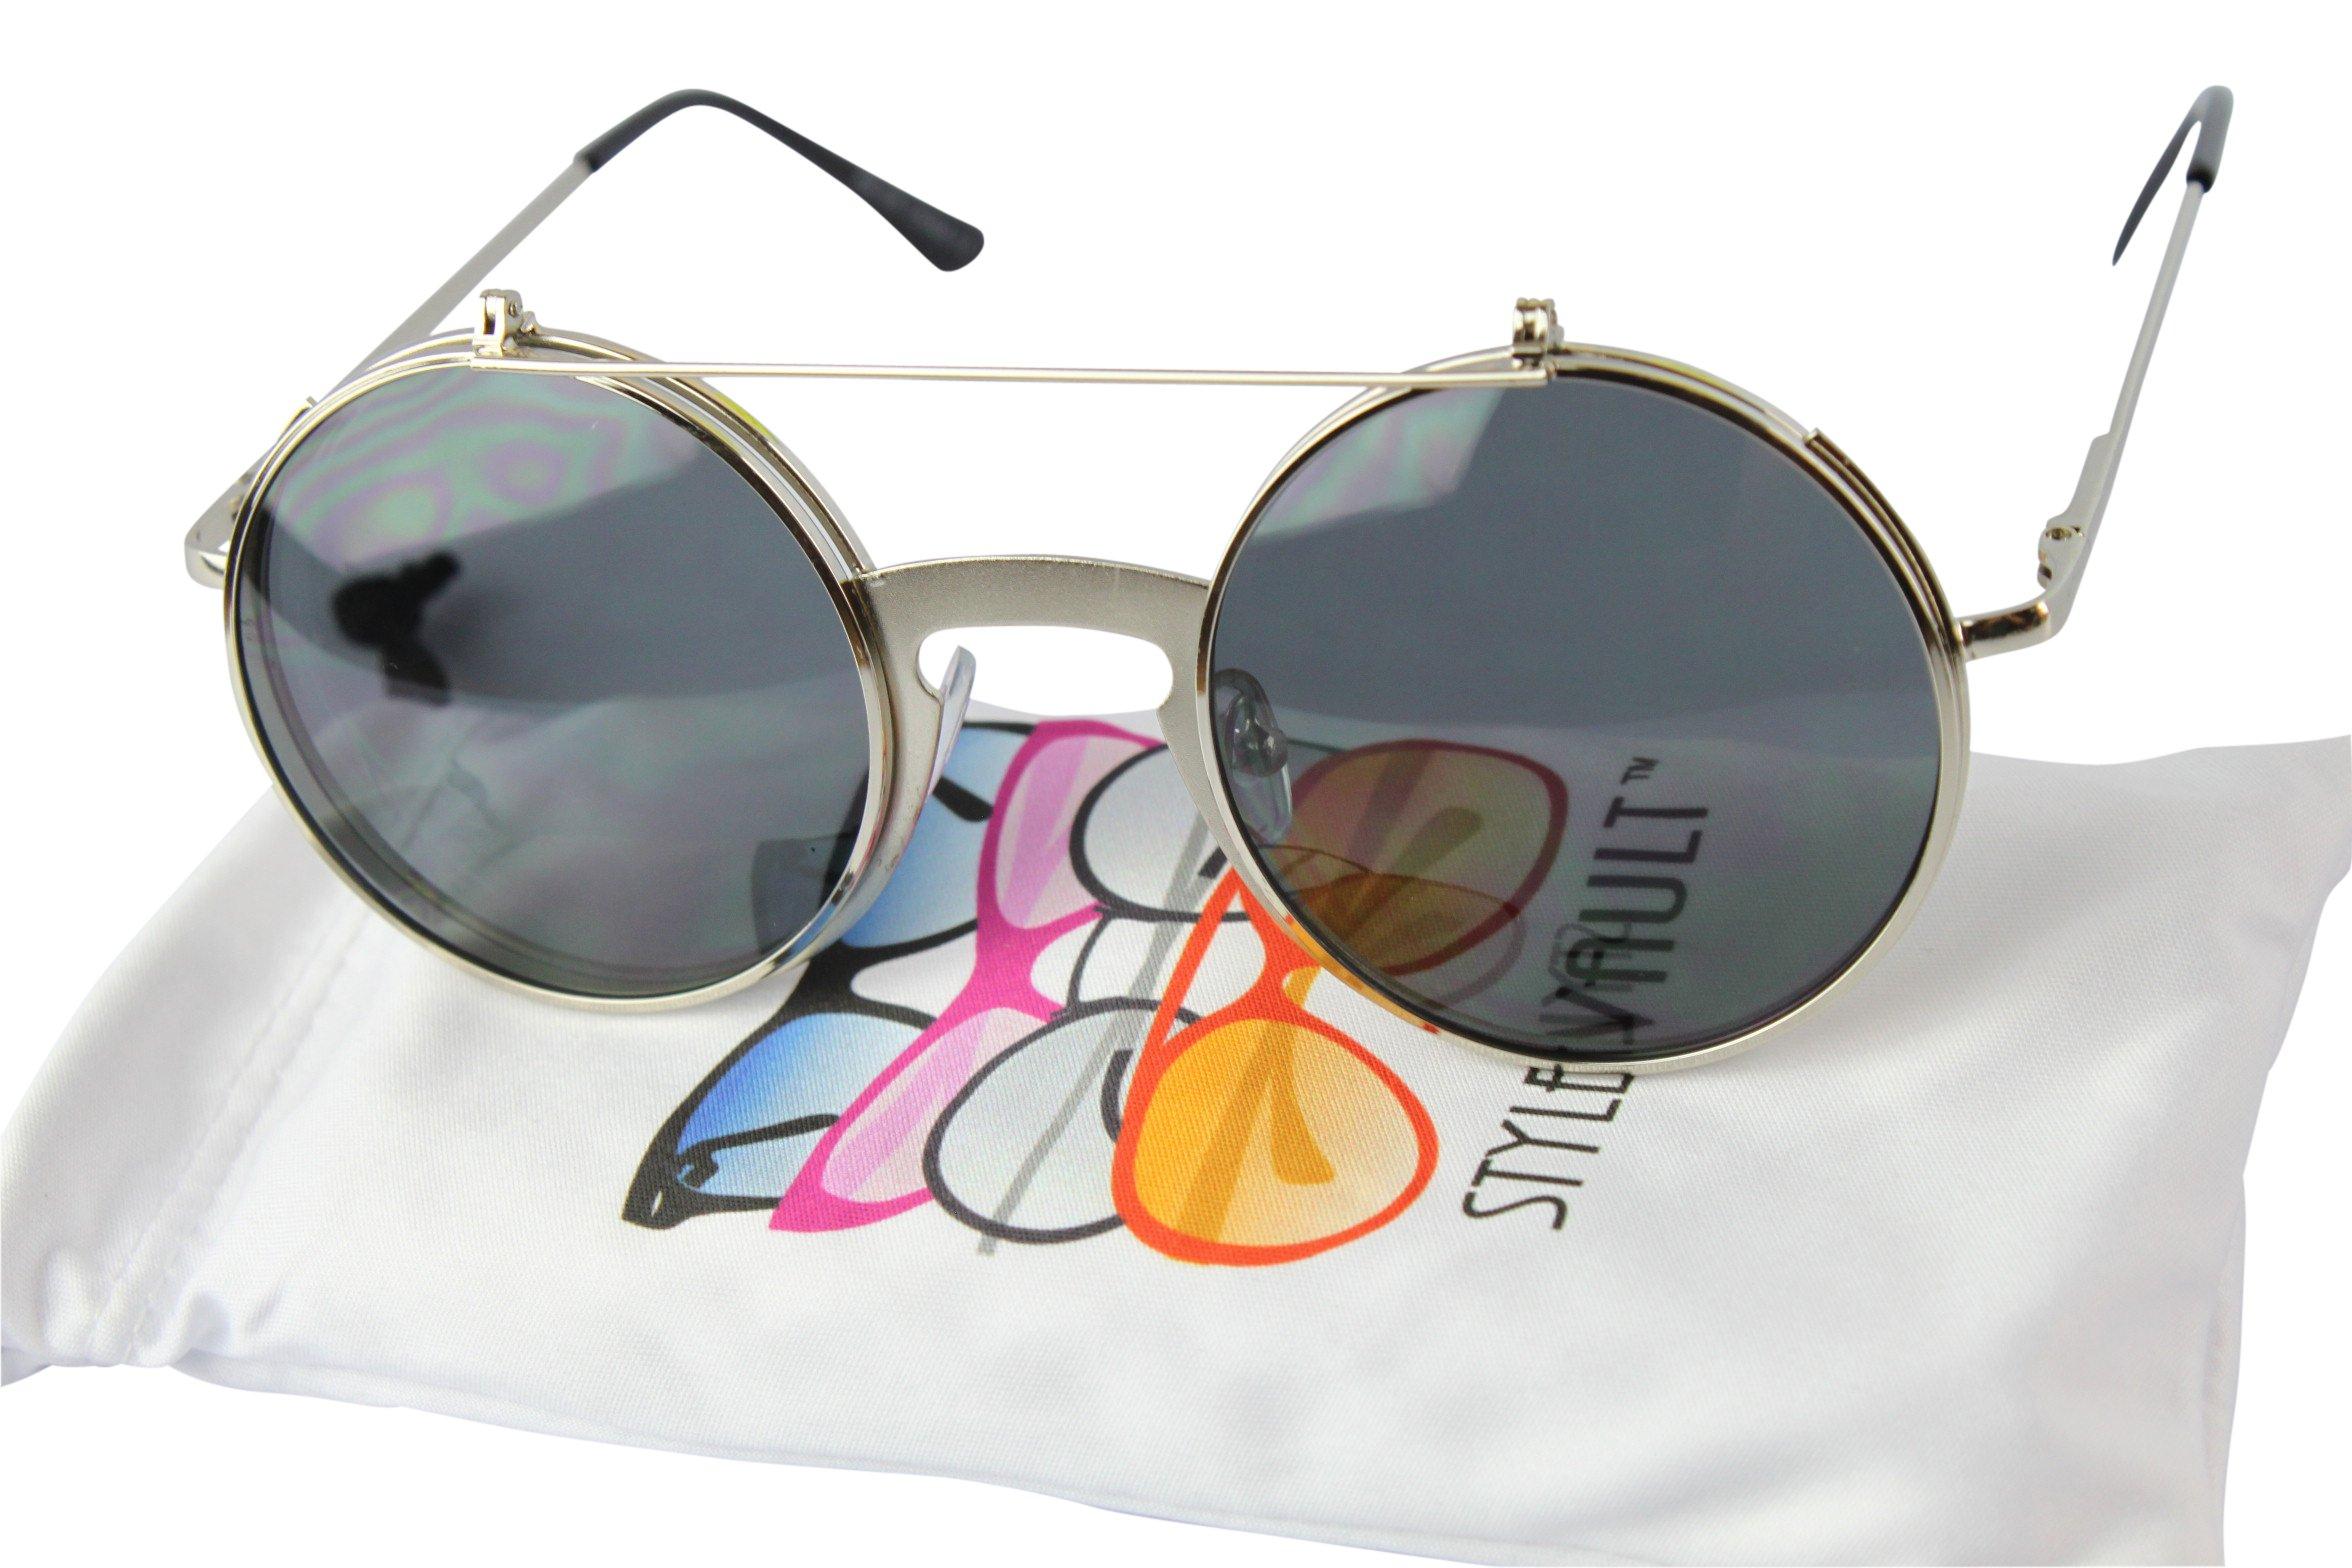 V135-vp Style Vault Round Flip up Django Steampunk Metal Sunglasses (C064 Silver, uv400)